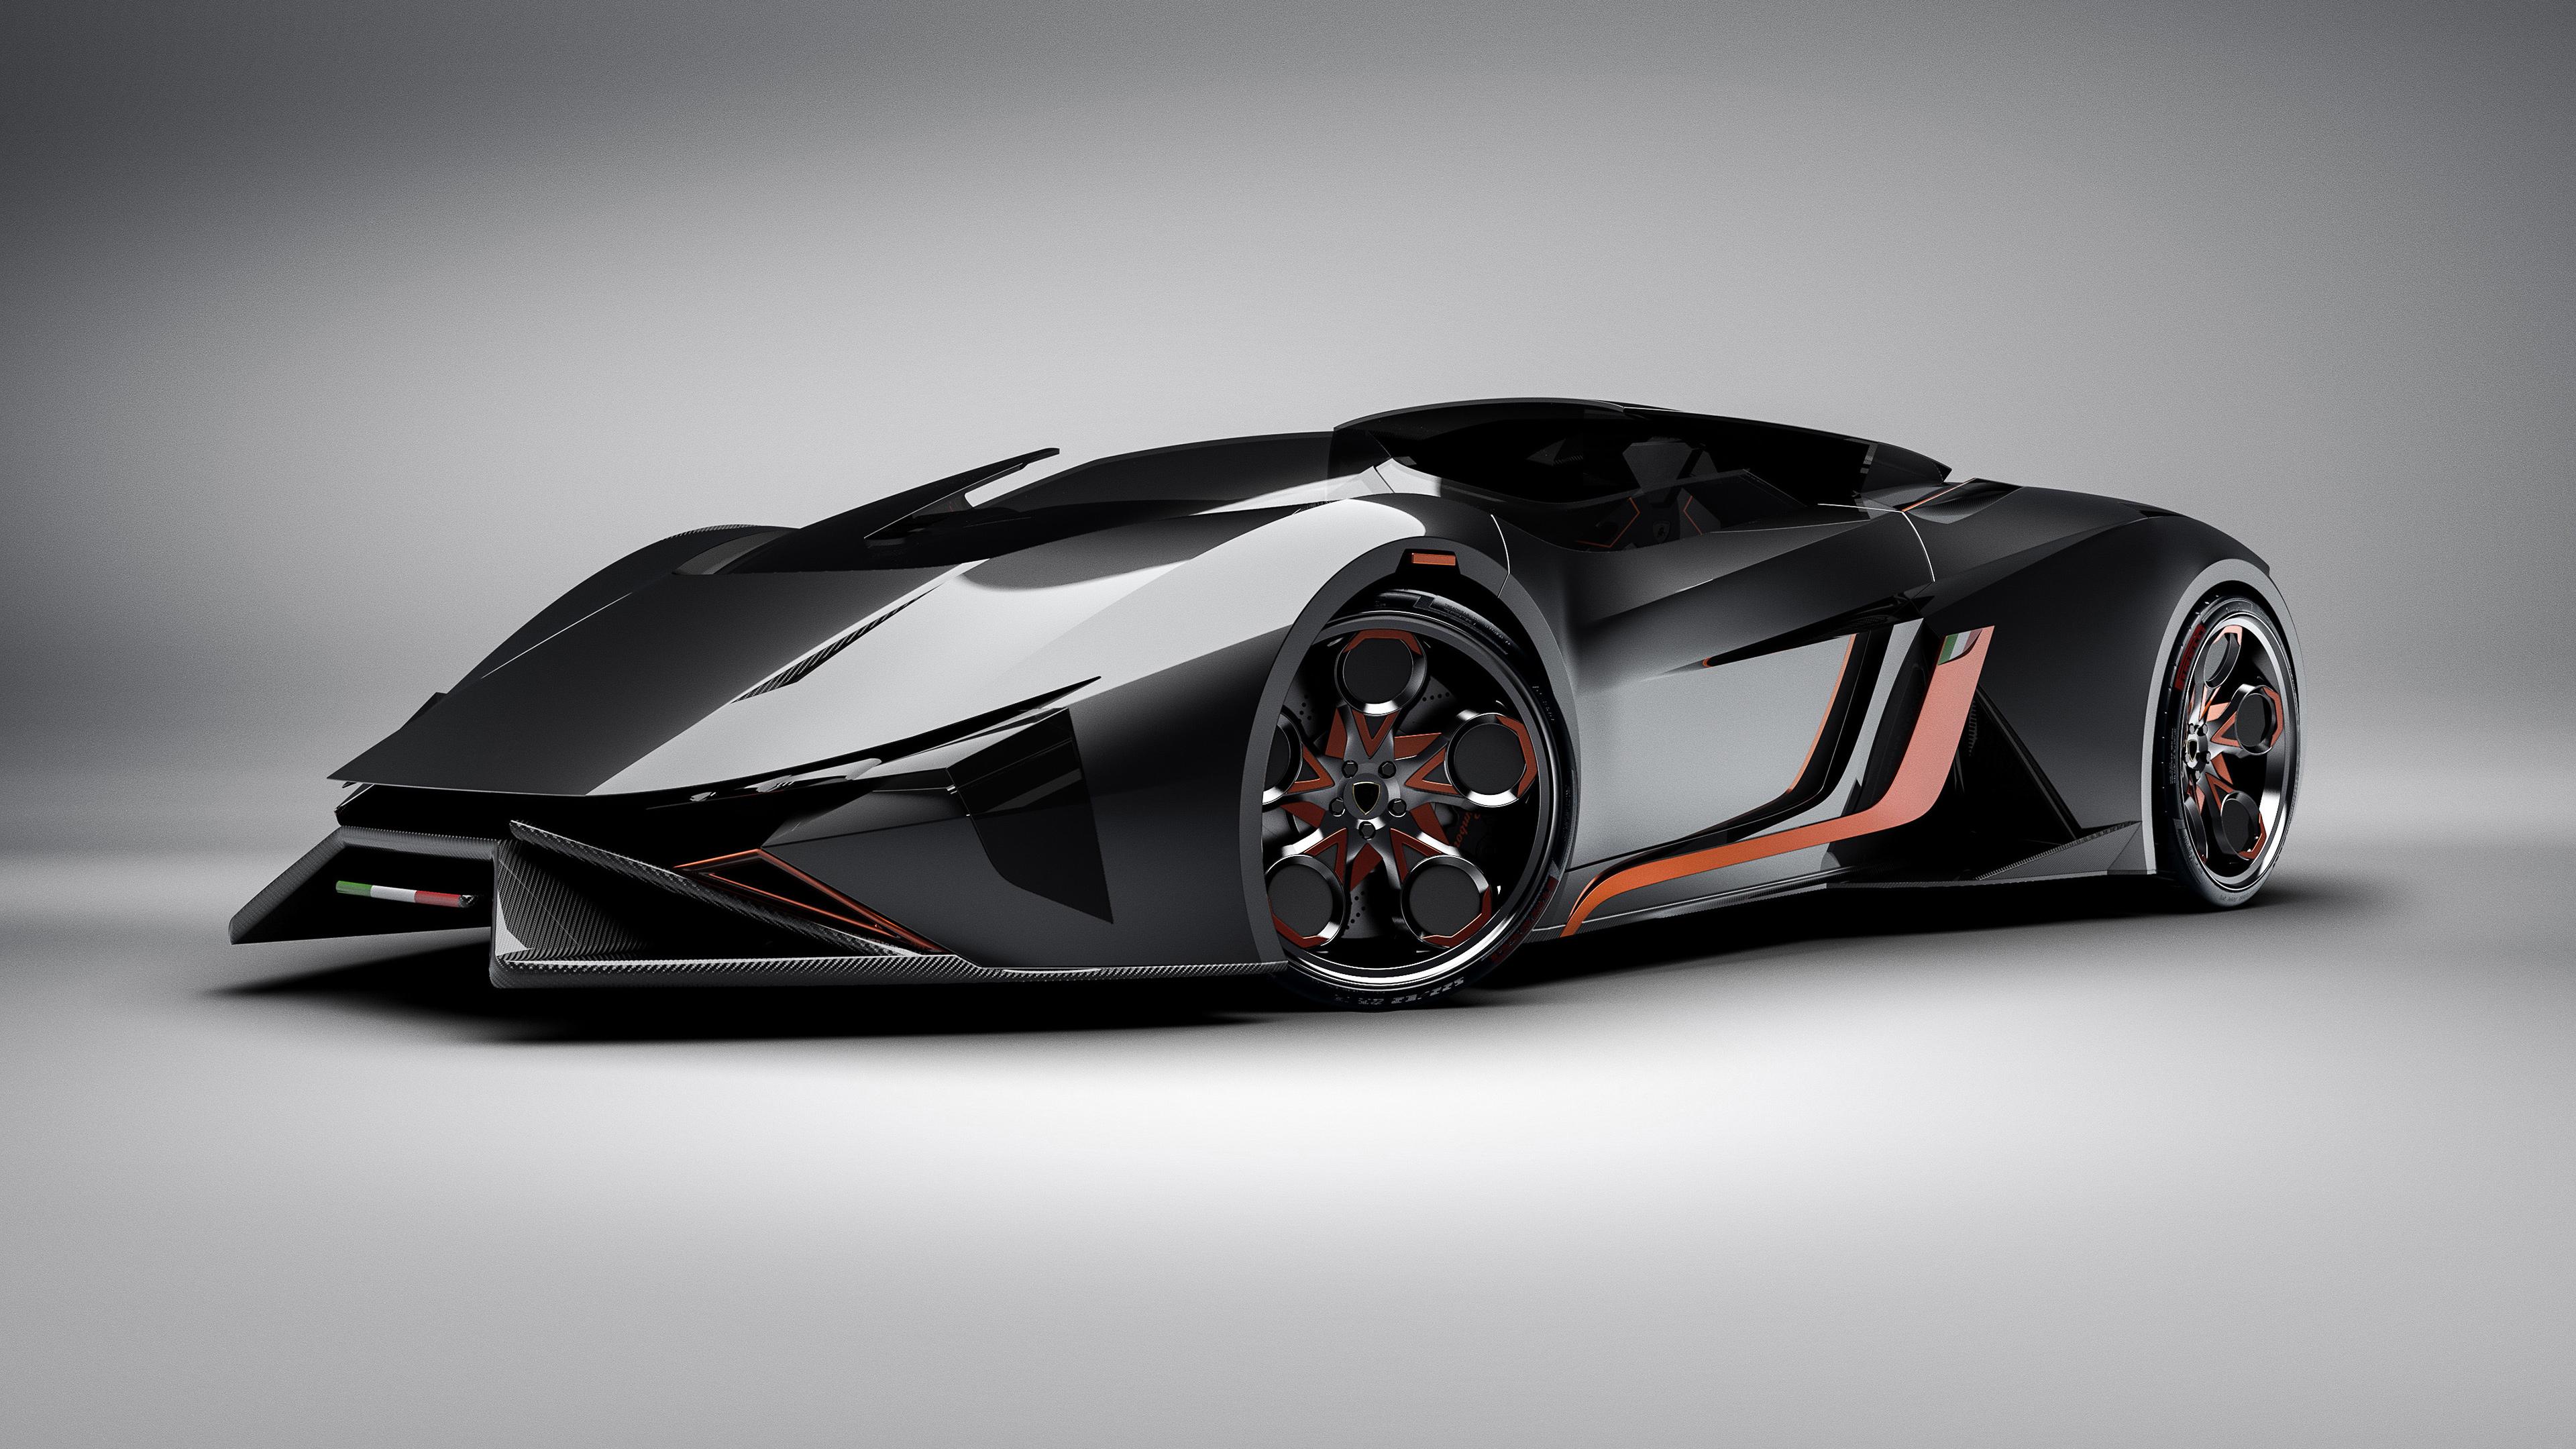 Tesla Car Iphone Wallpaper Lamborghini Diamante Concept Car 4k Wallpaper Hd Car